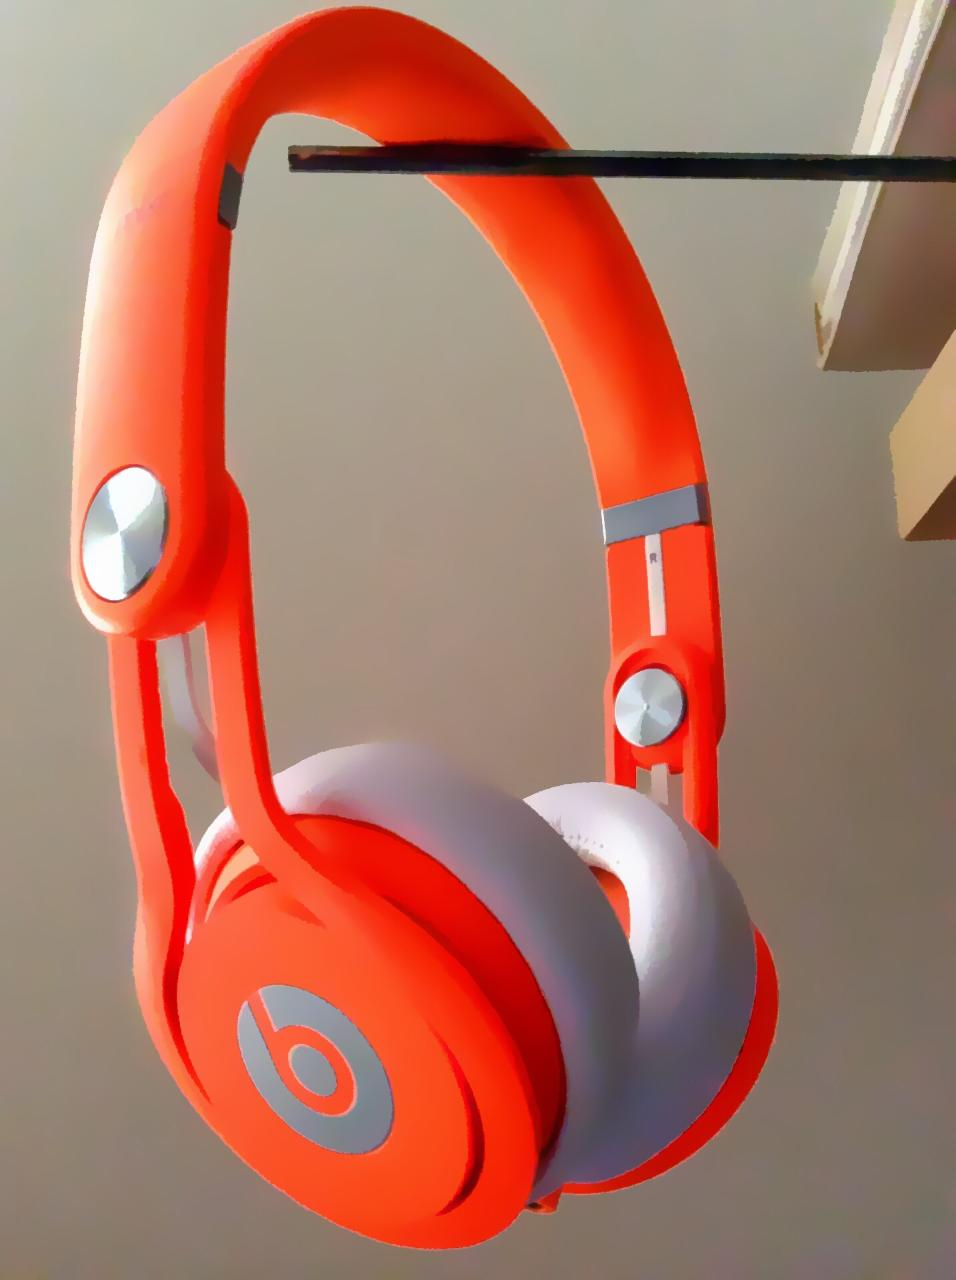 Neon orange mixr beats (with photo hard blur filter)